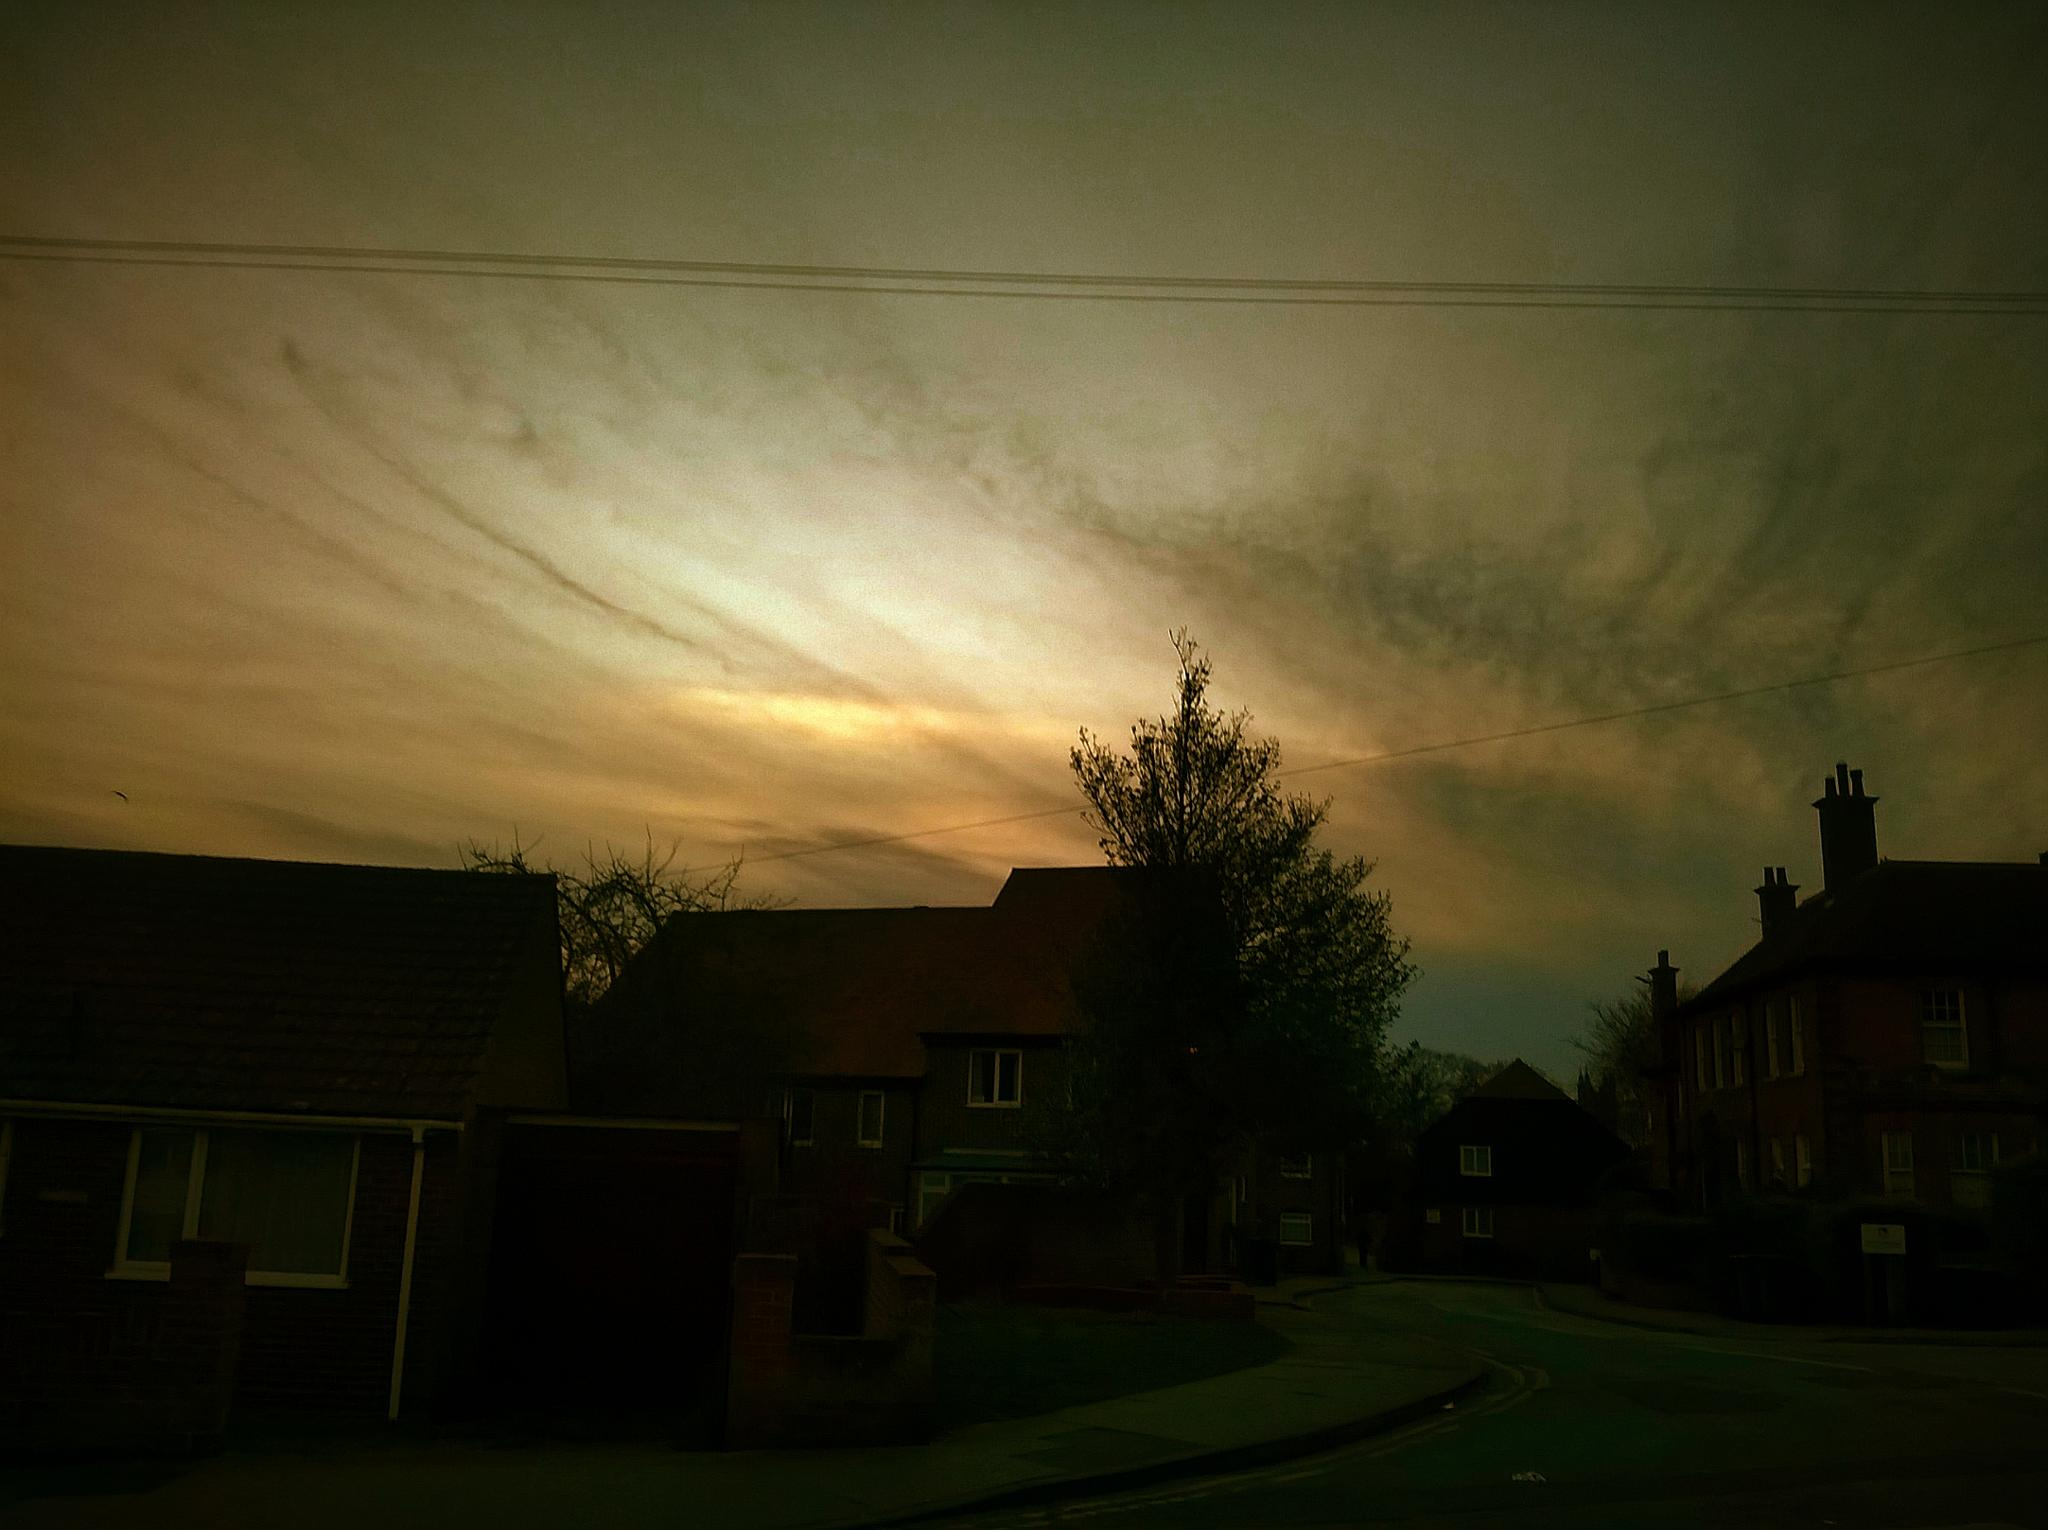 Evening Sky by gemma smith